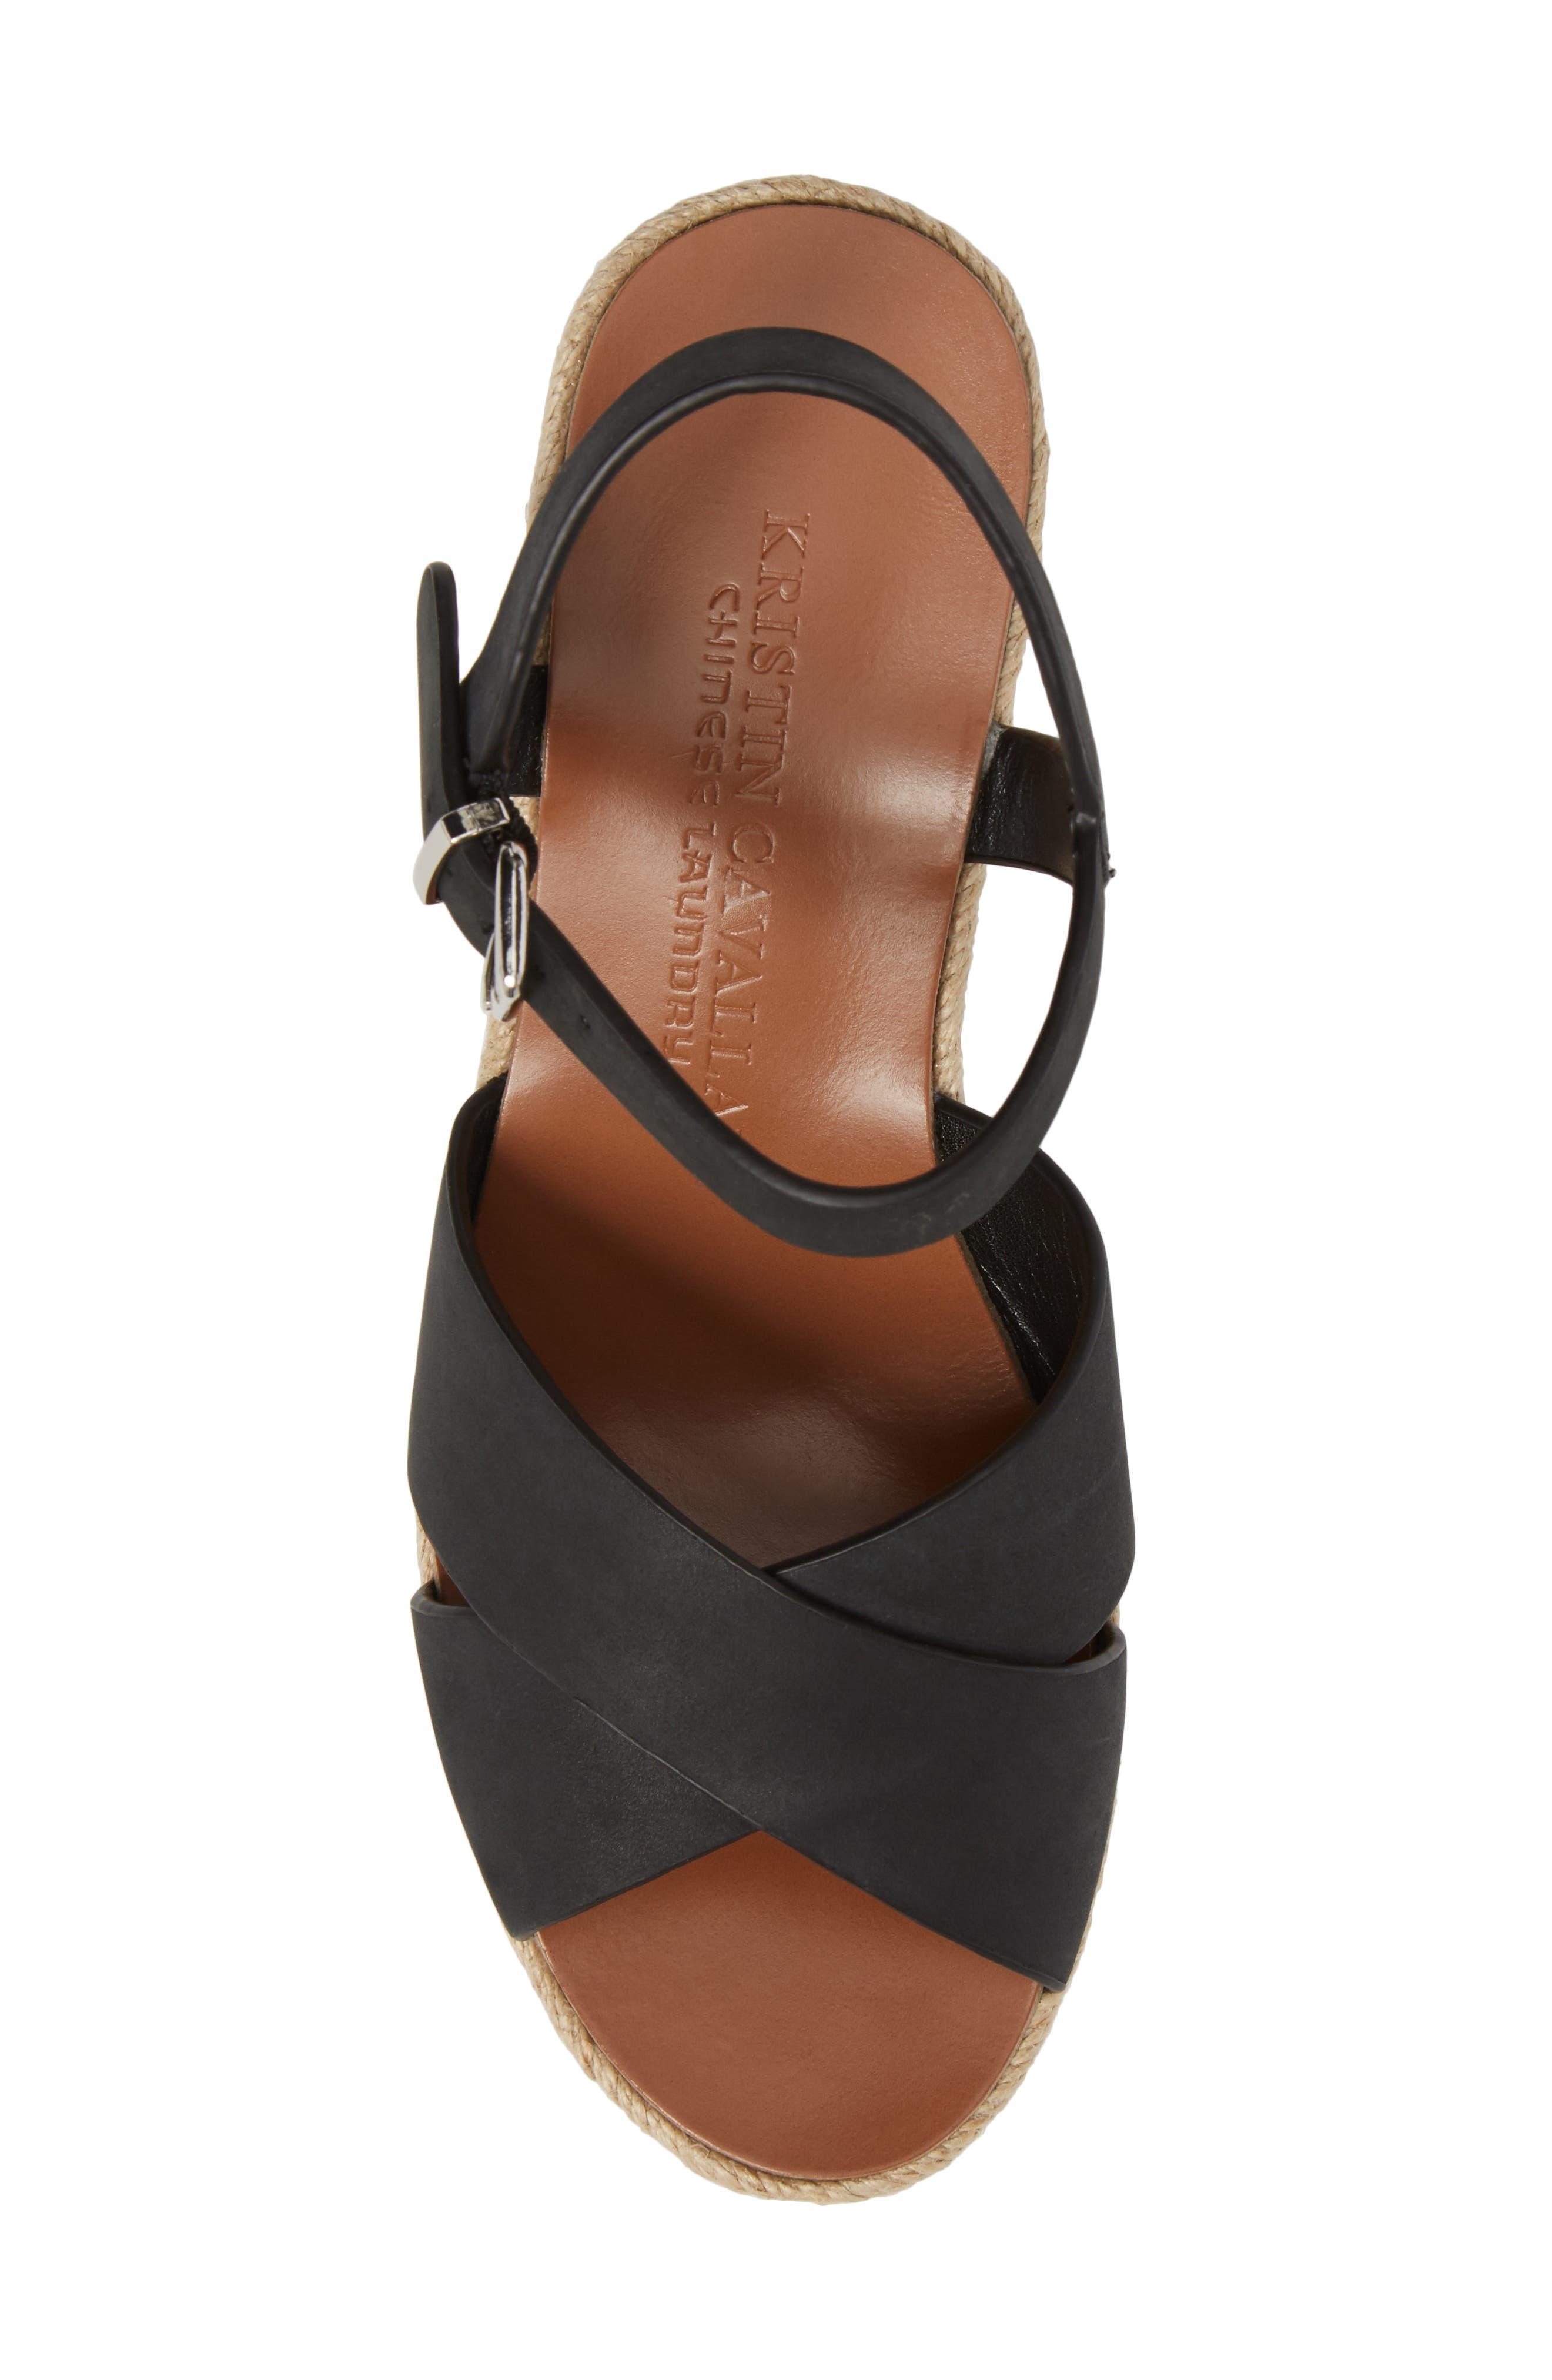 Mikah Espadrille Wedge Sandal,                             Alternate thumbnail 5, color,                             001